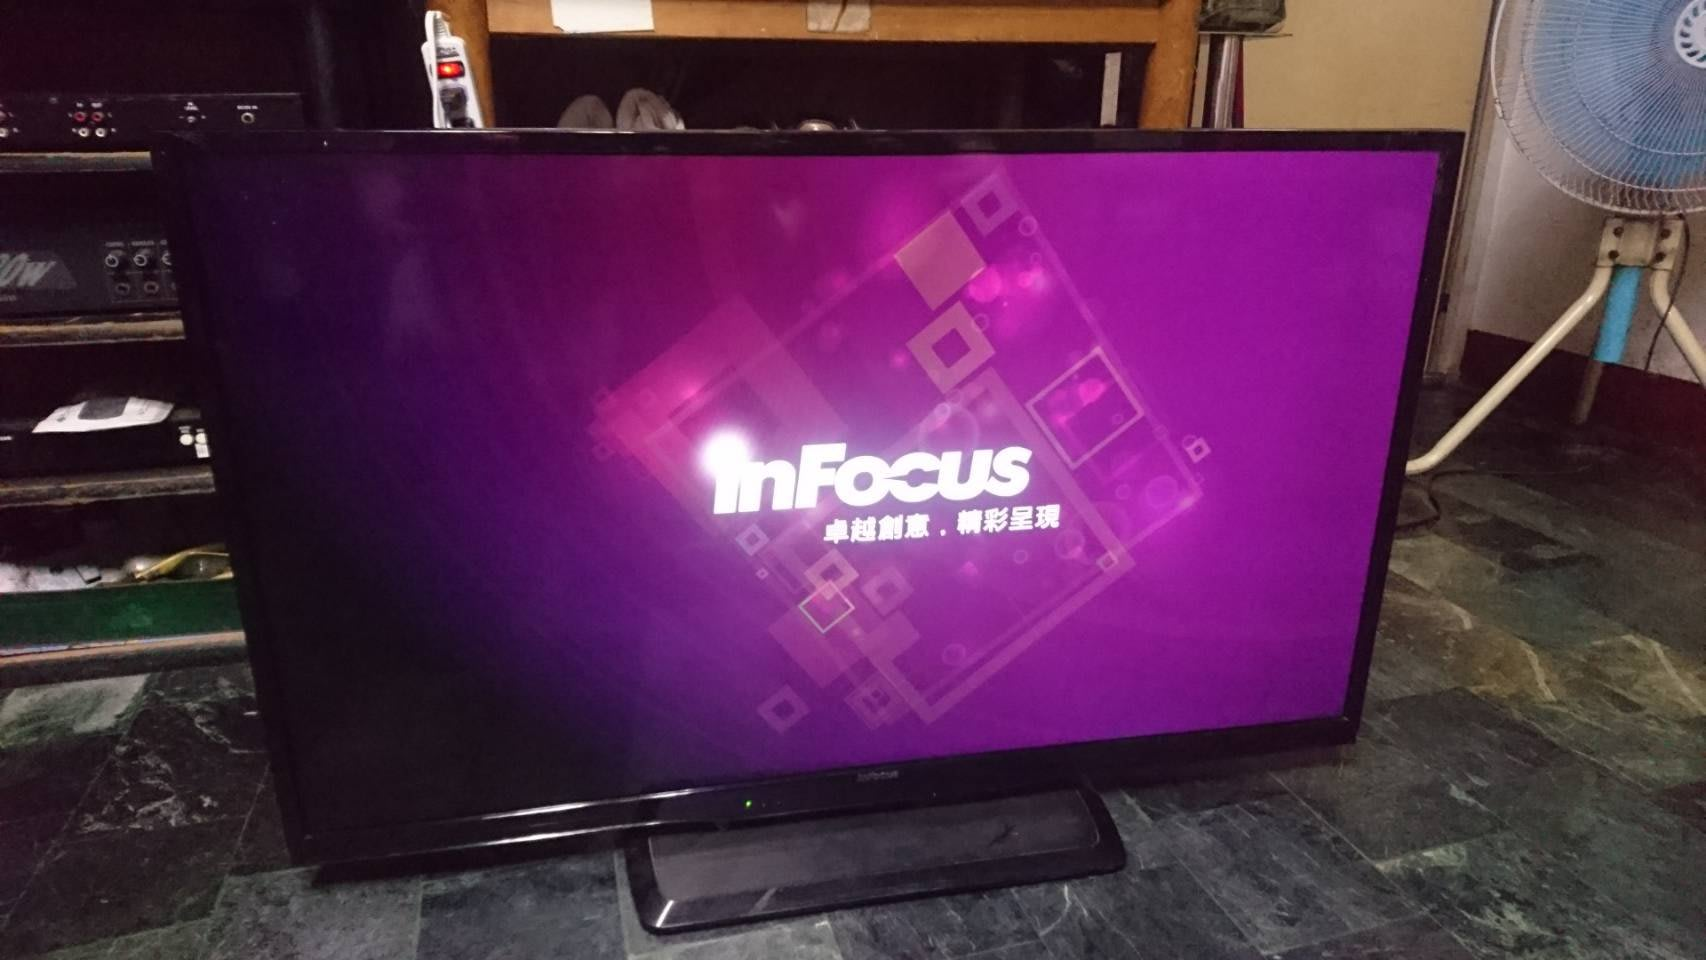 鴻海 InFocus 40吋 LED 液晶電視